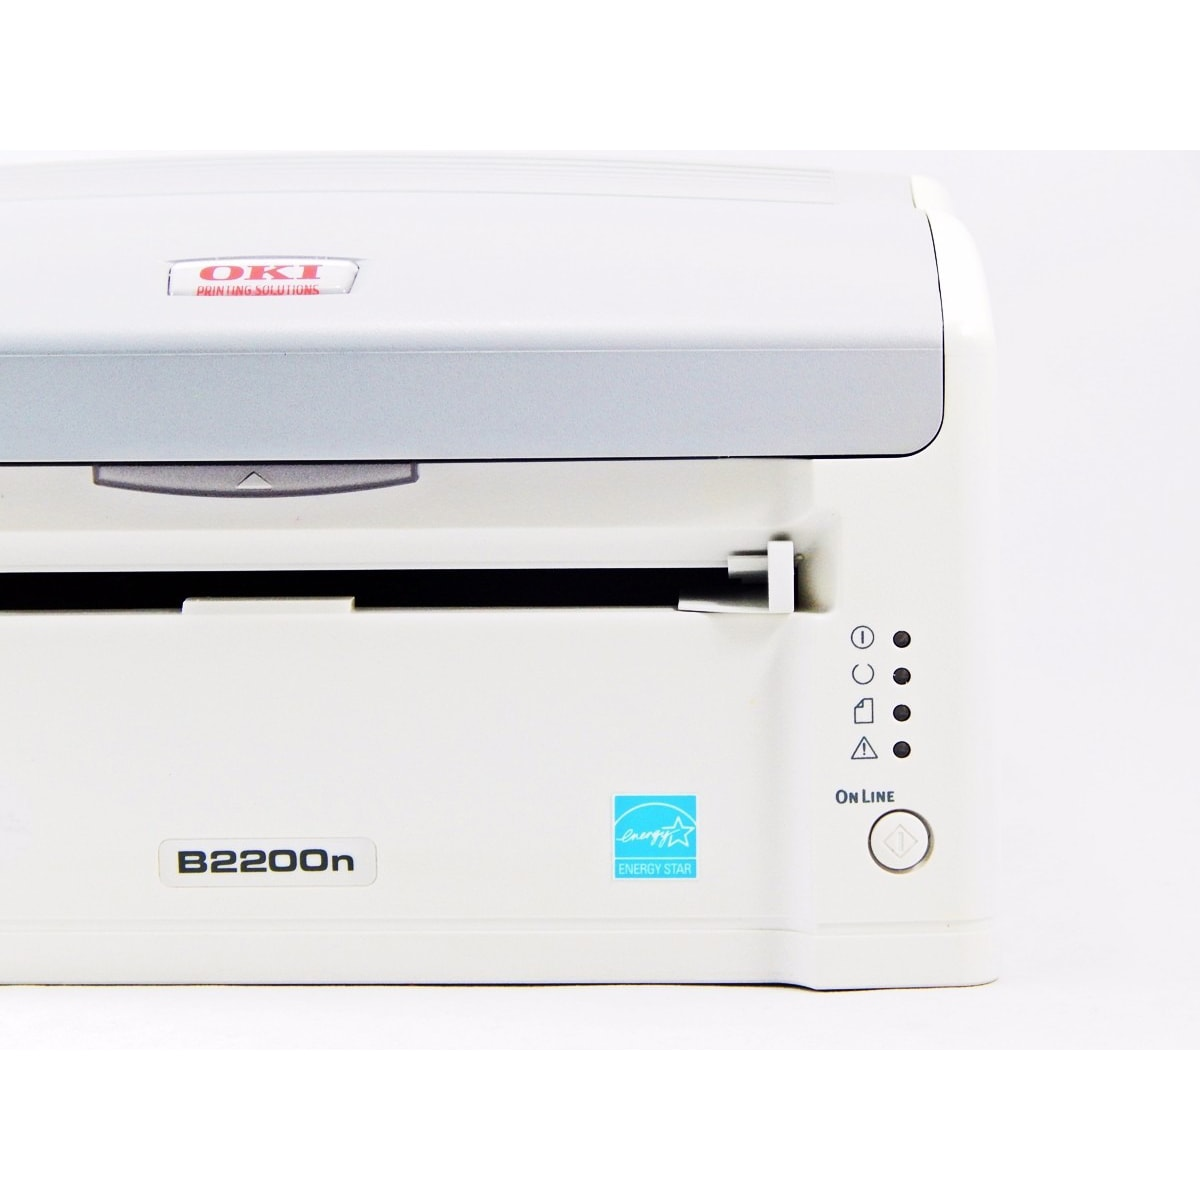 Impressora Laser Monocromática OKI B2200n c/ Toner - Usada